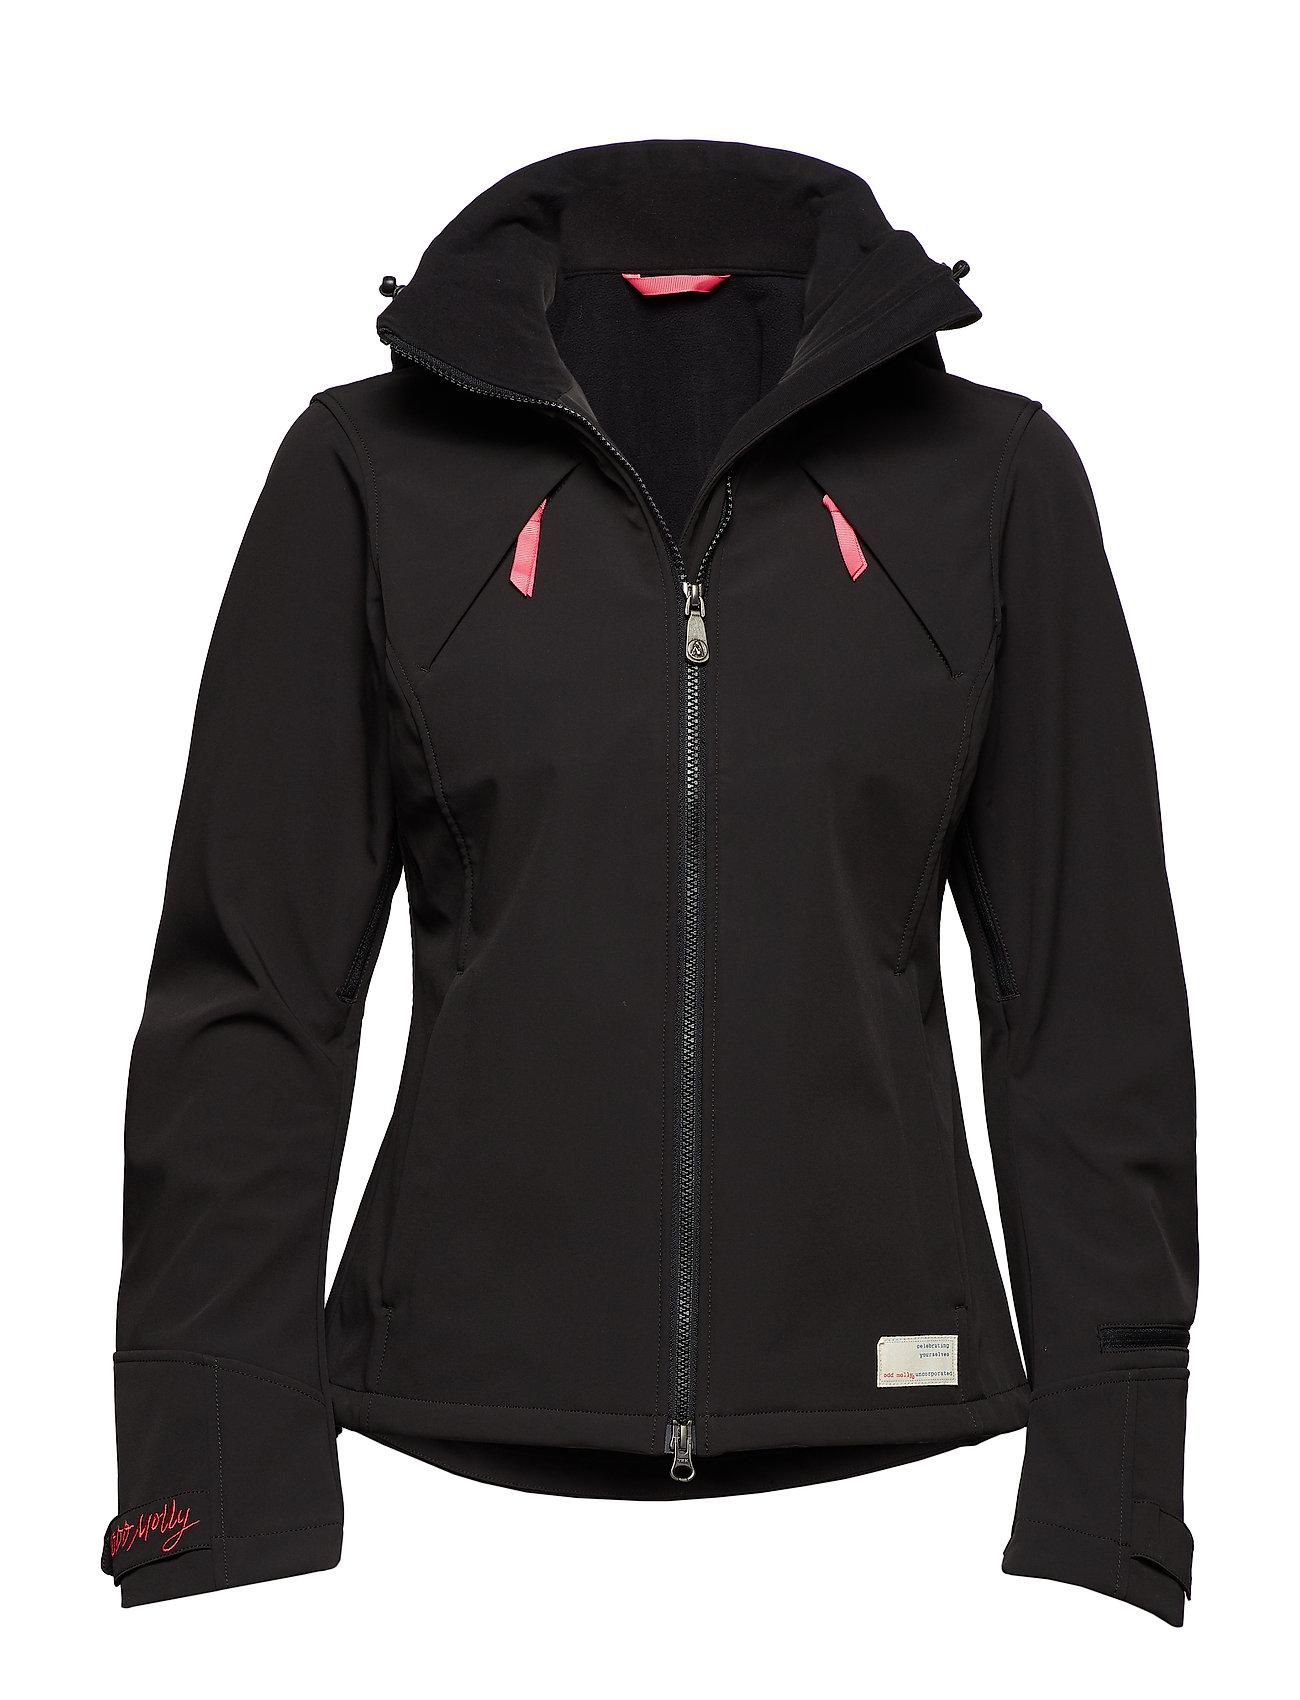 ODD MOLLY ACTIVE WEAR drifting jacket